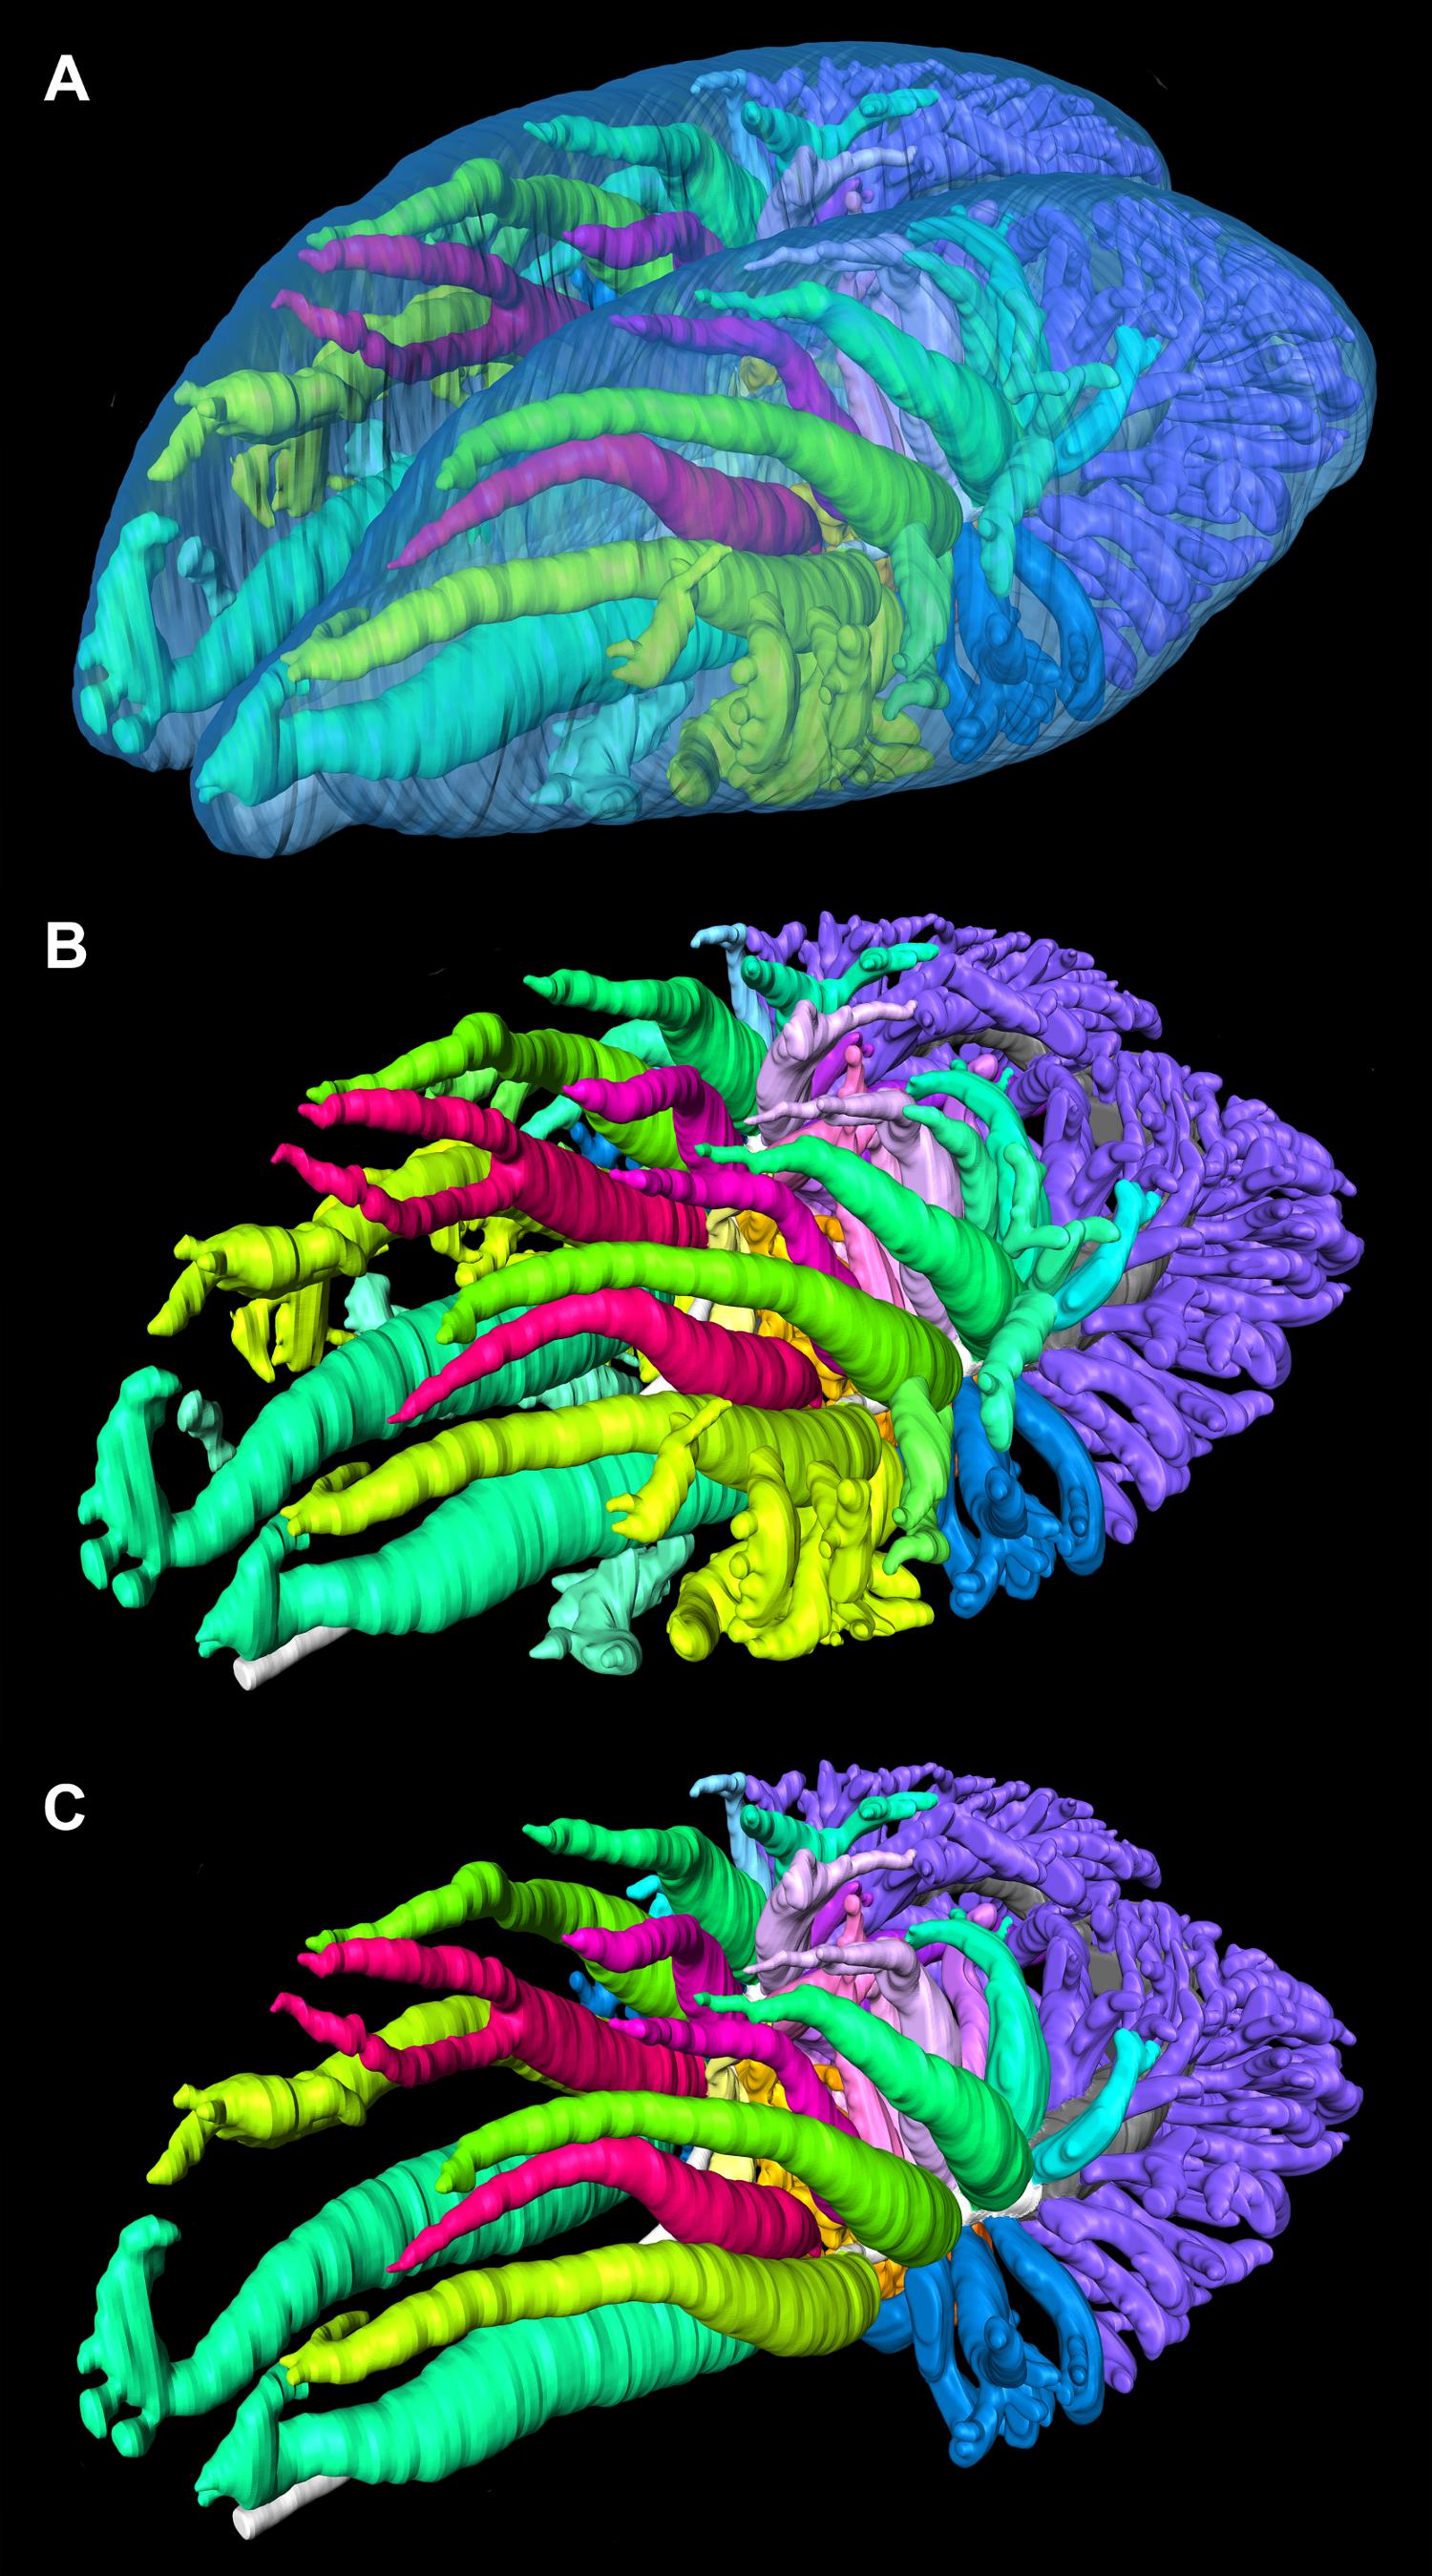 Pulmonary Anatomy In The Nile Crocodile And The Evolution Of